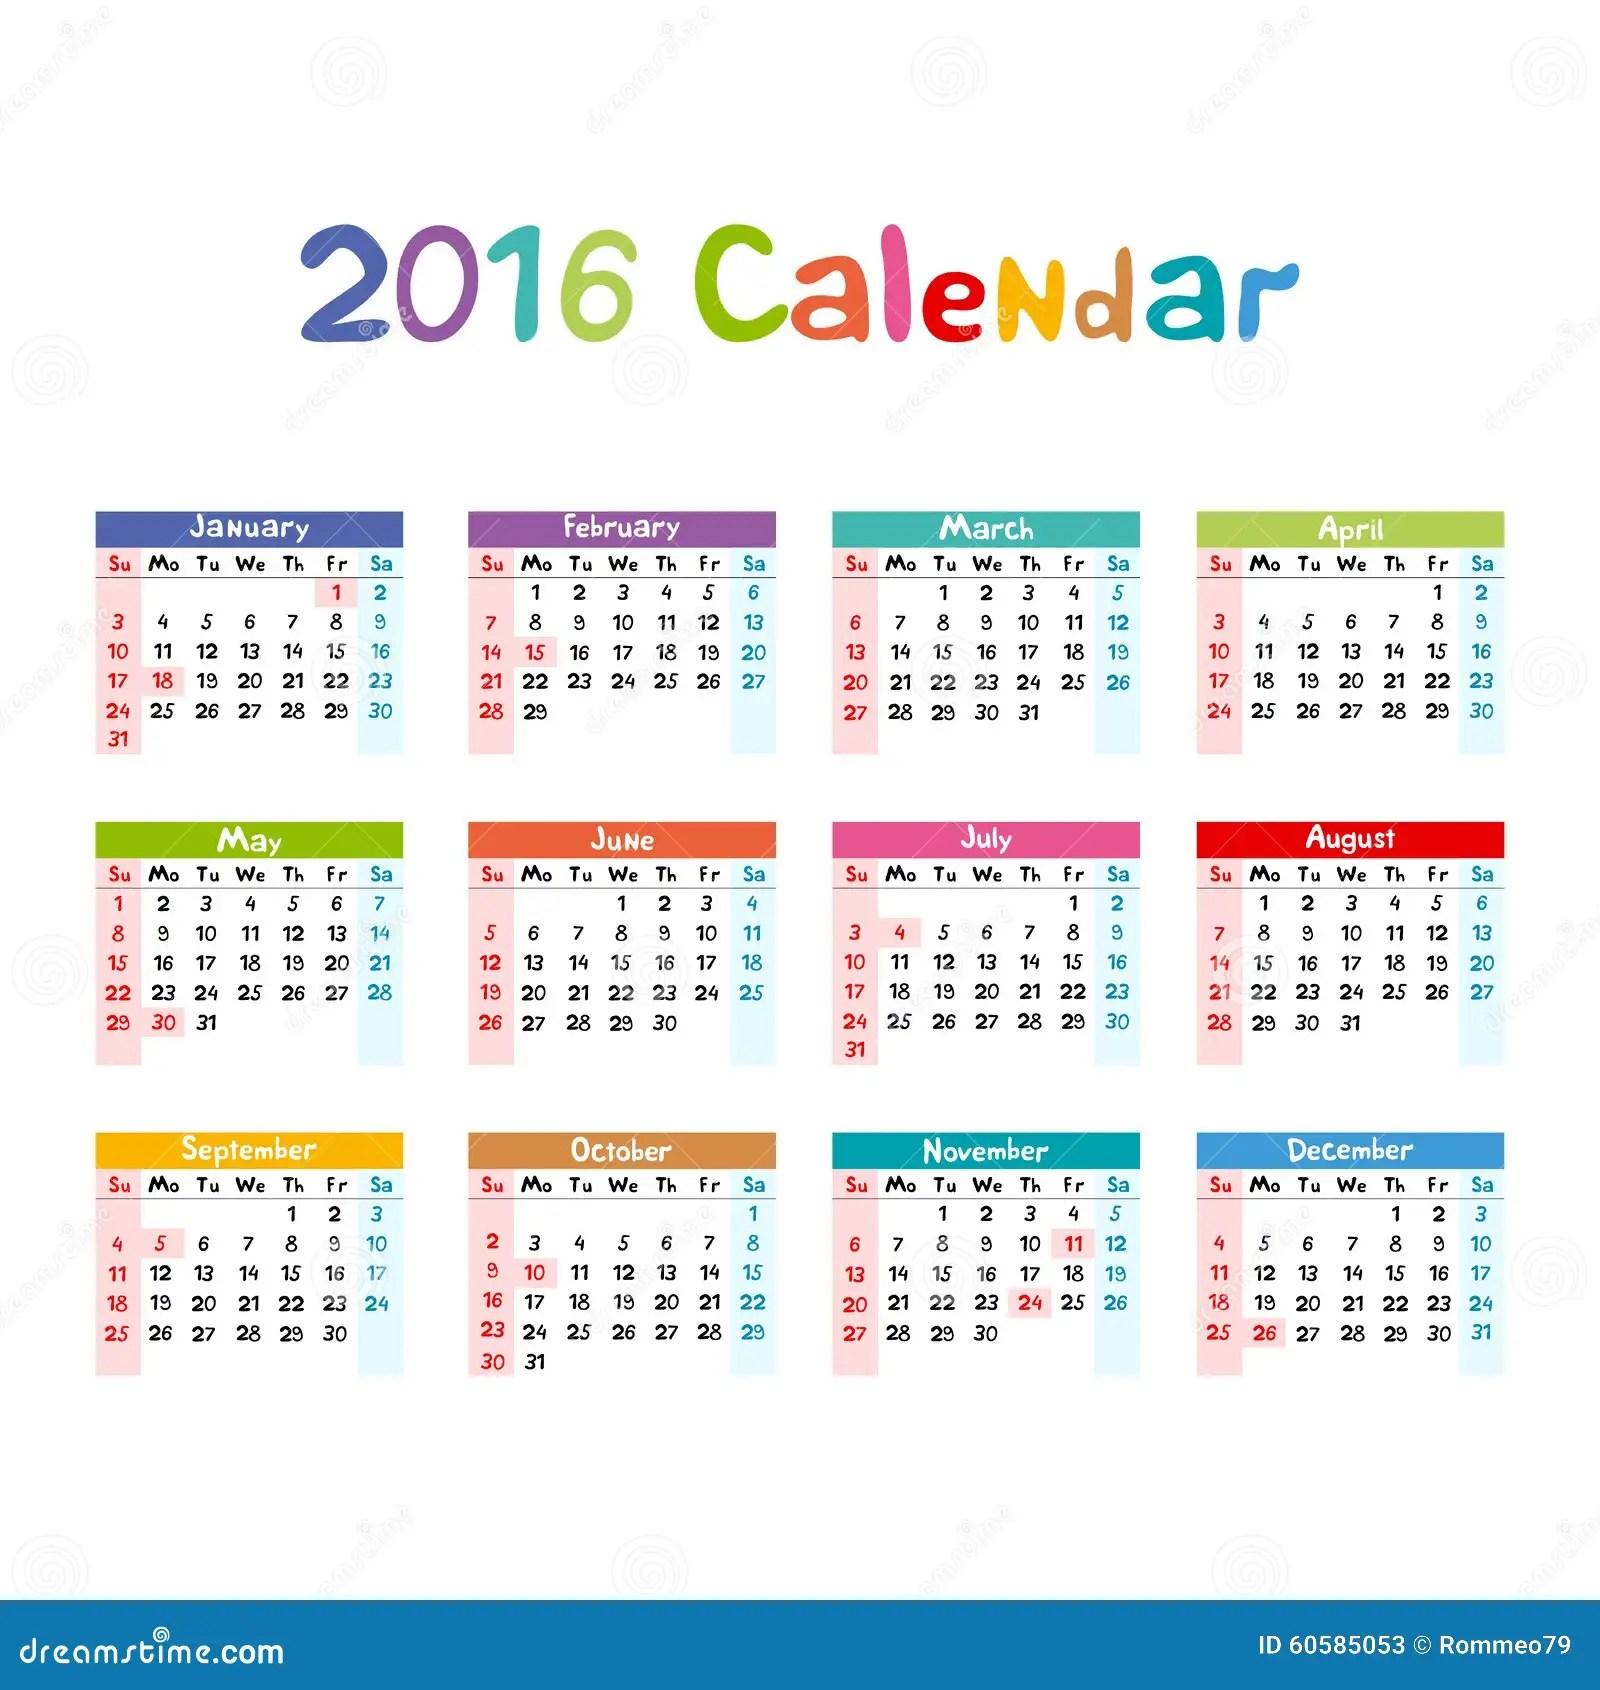 Free Printable November 2017 Monthly Planner 2016 Calendar Illustration Vector Kids Hand Made Stock